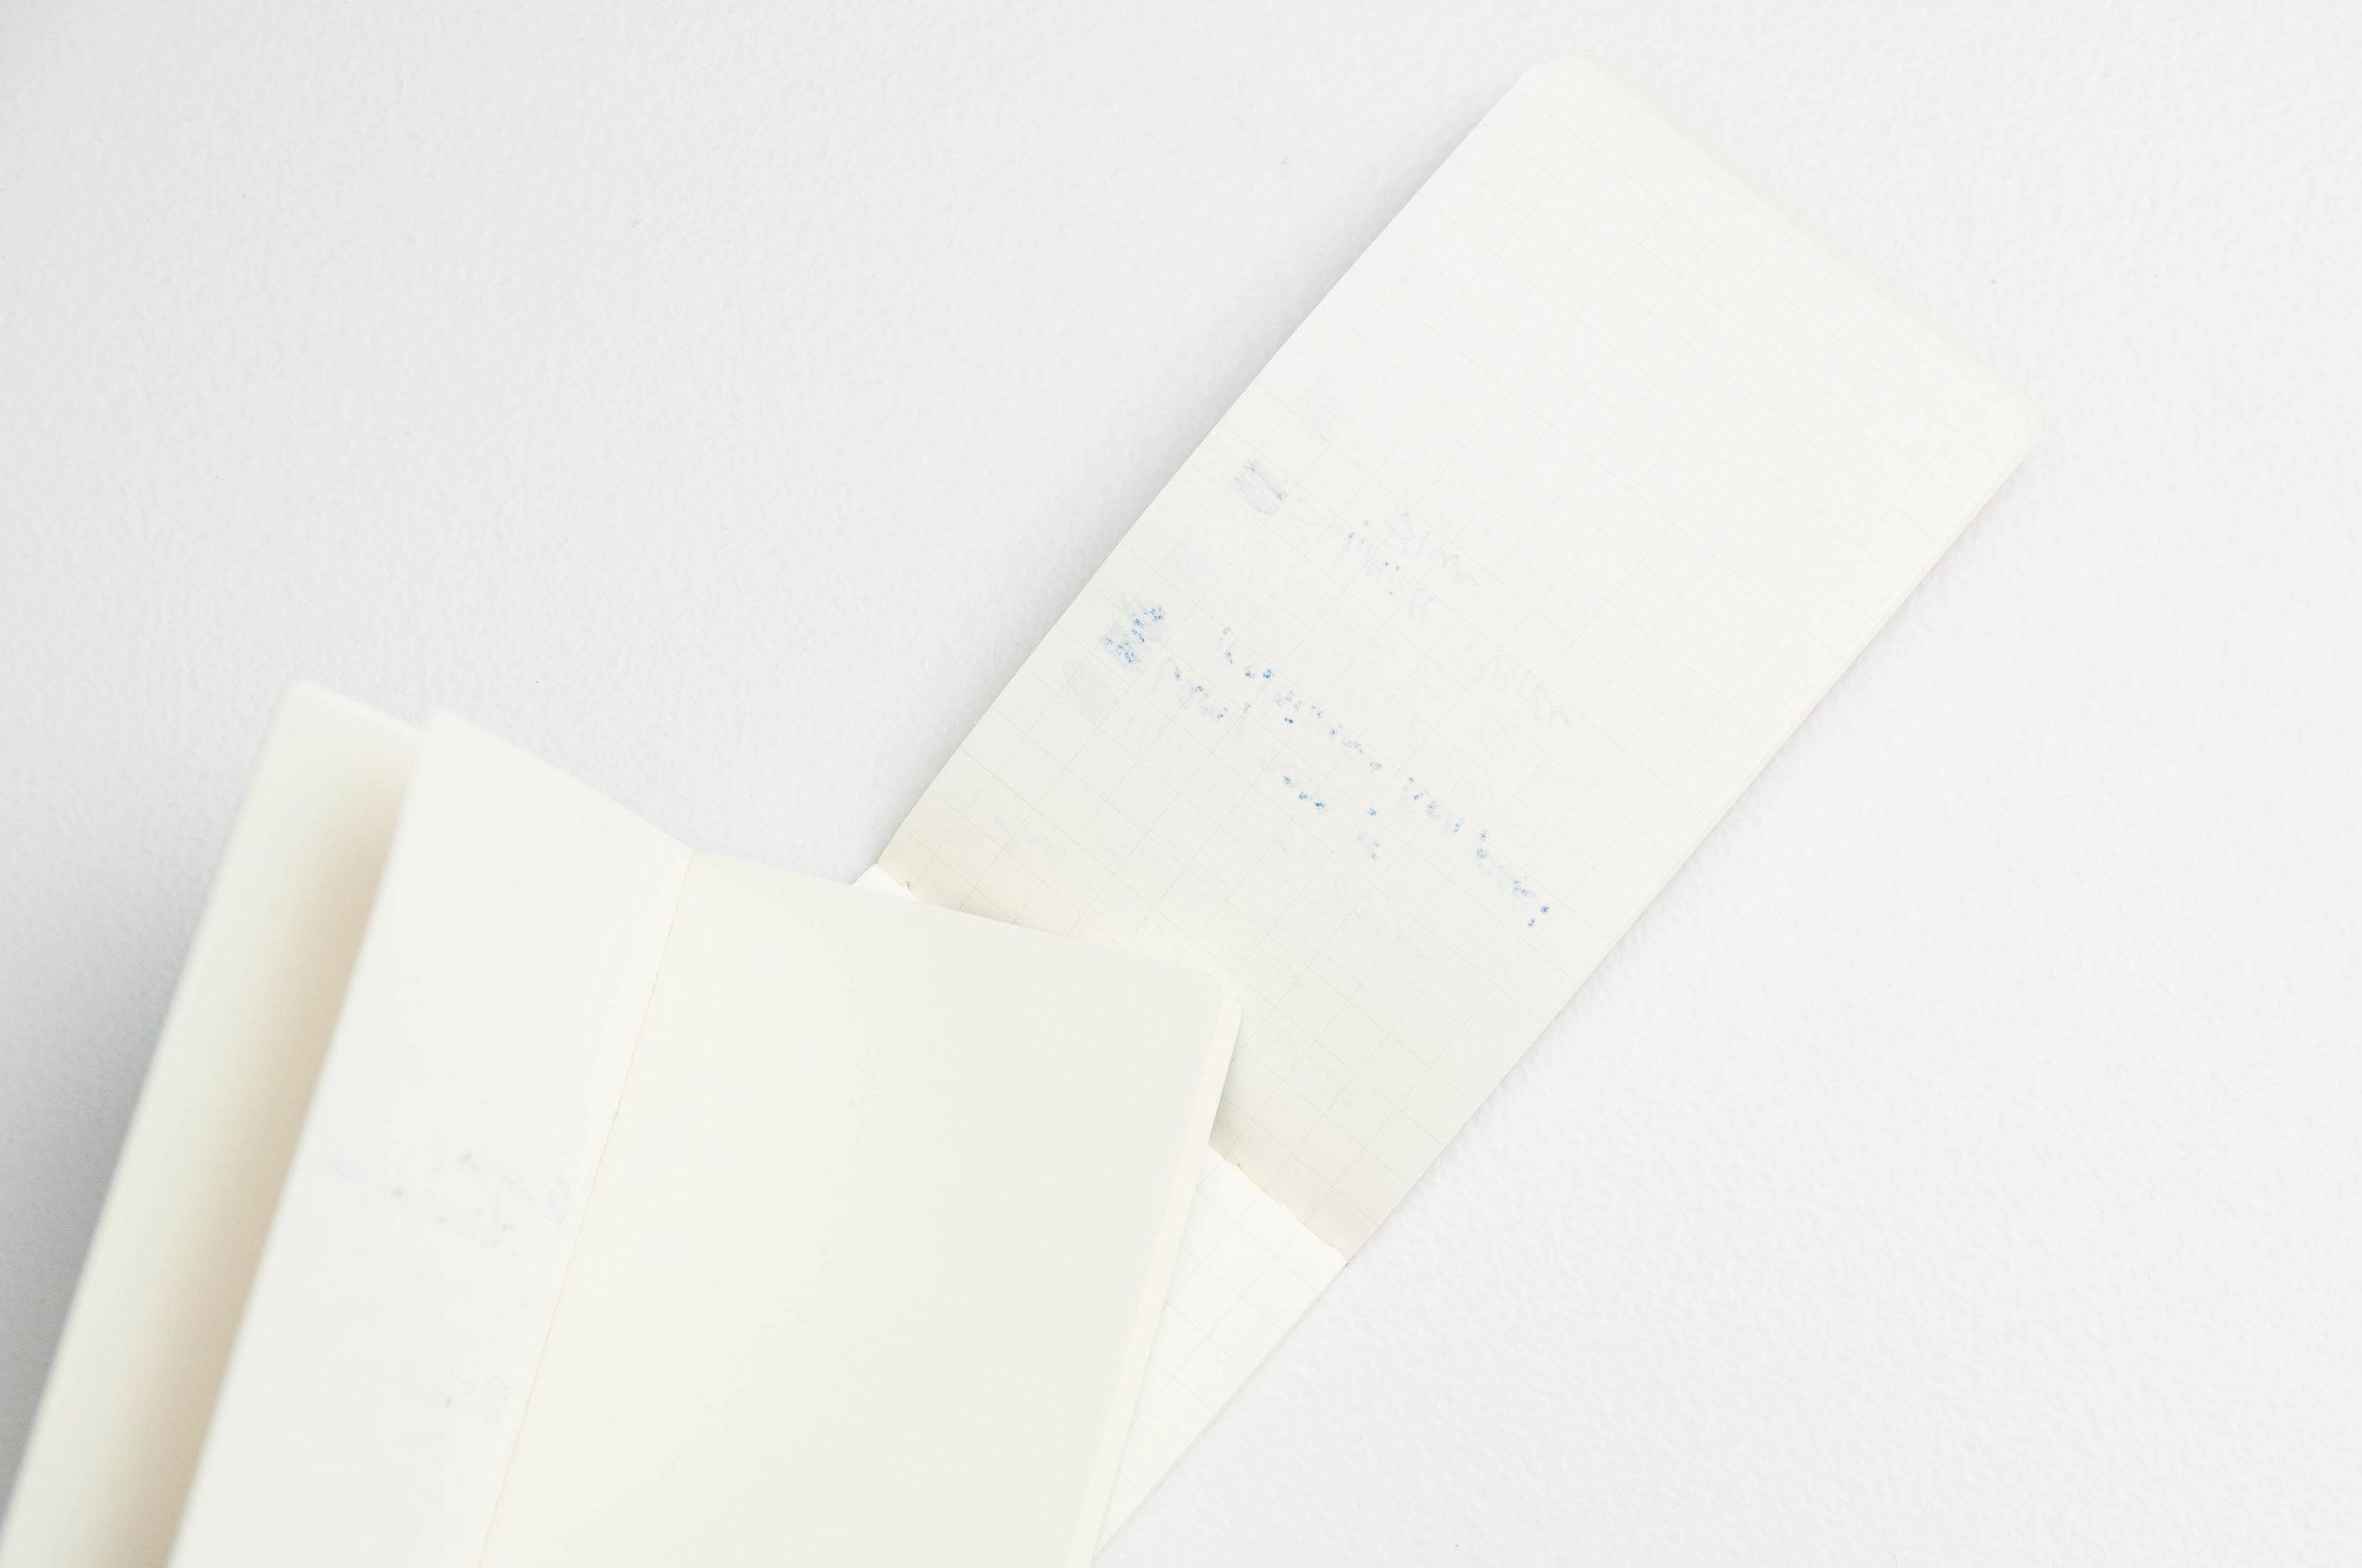 Maruai Basic Notebooks Paper